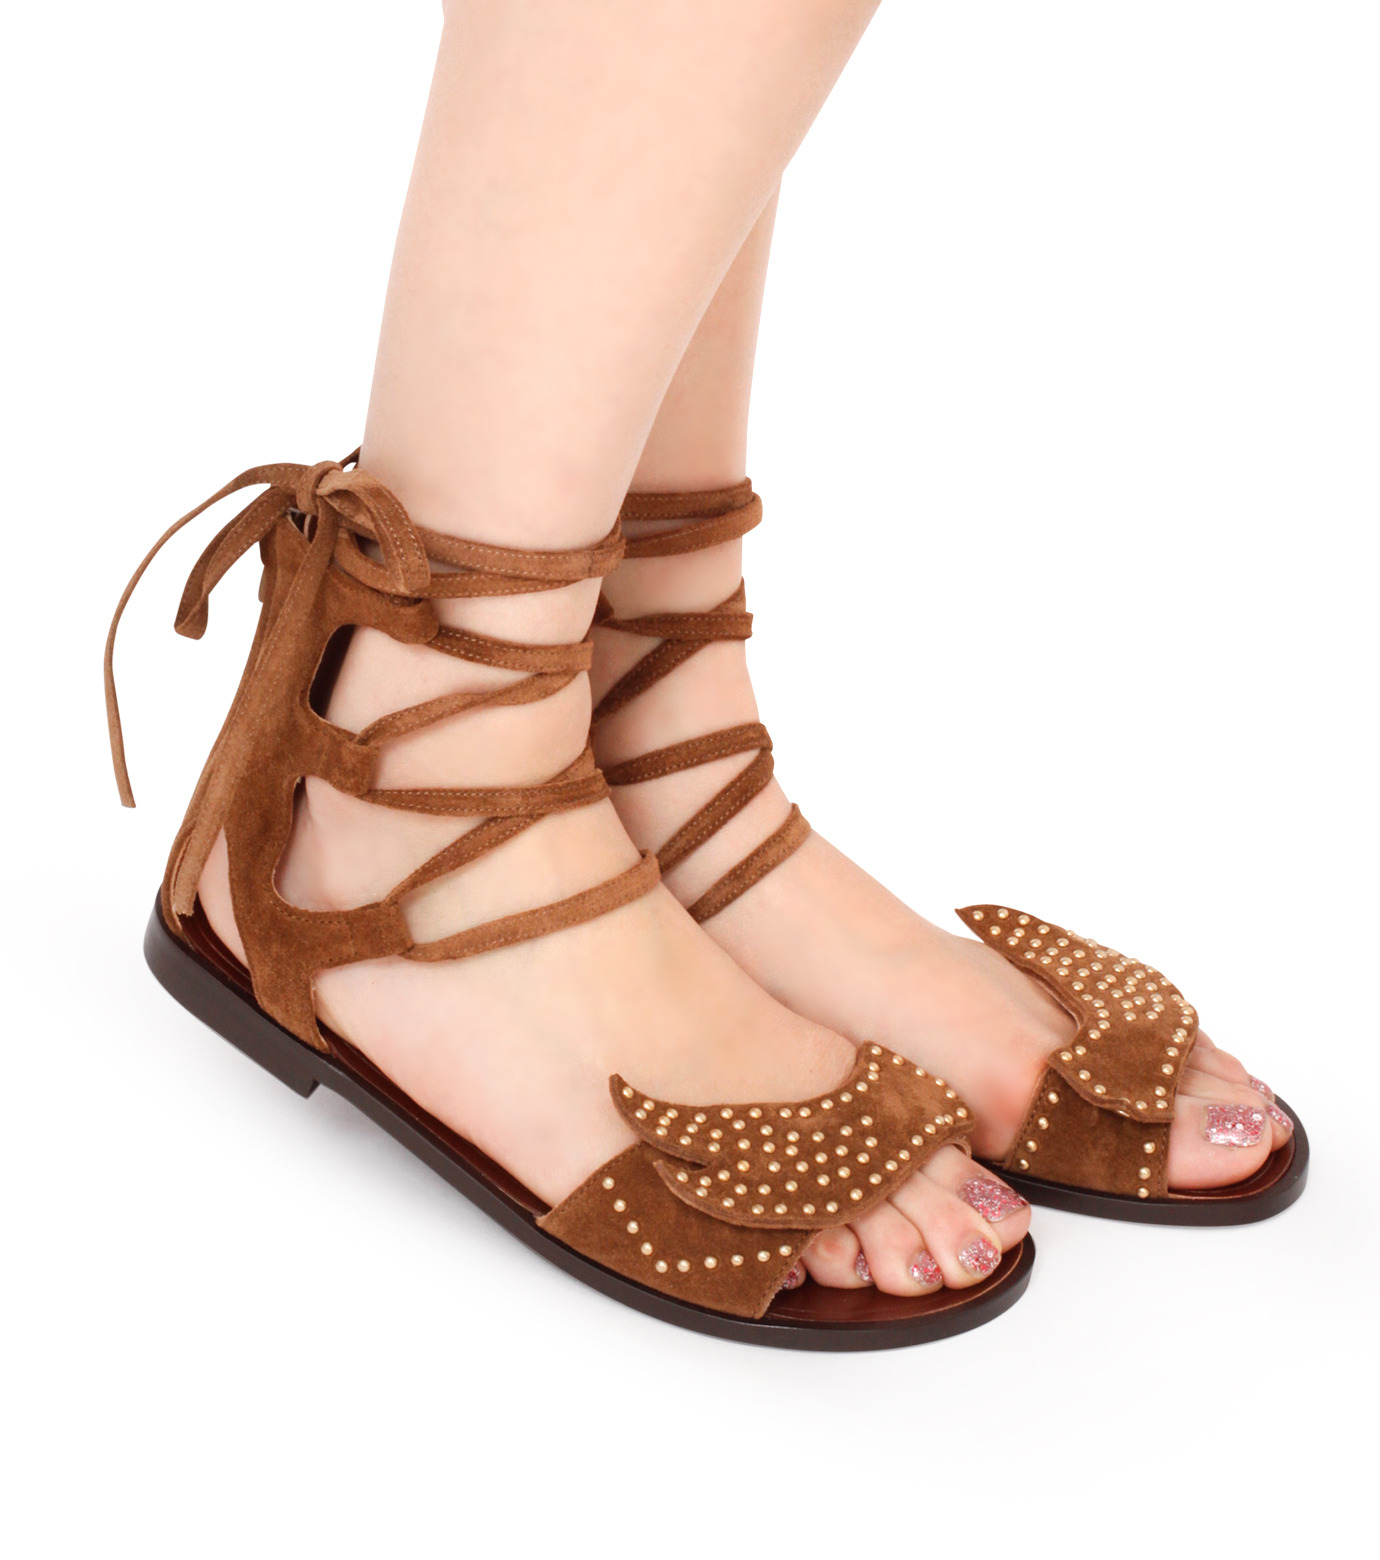 PIPPICHIC(ピッピシック)のbird lace-up flat sandal-BROWN(シューズ/shoes)-PP16S-BIRD24-42 拡大詳細画像5